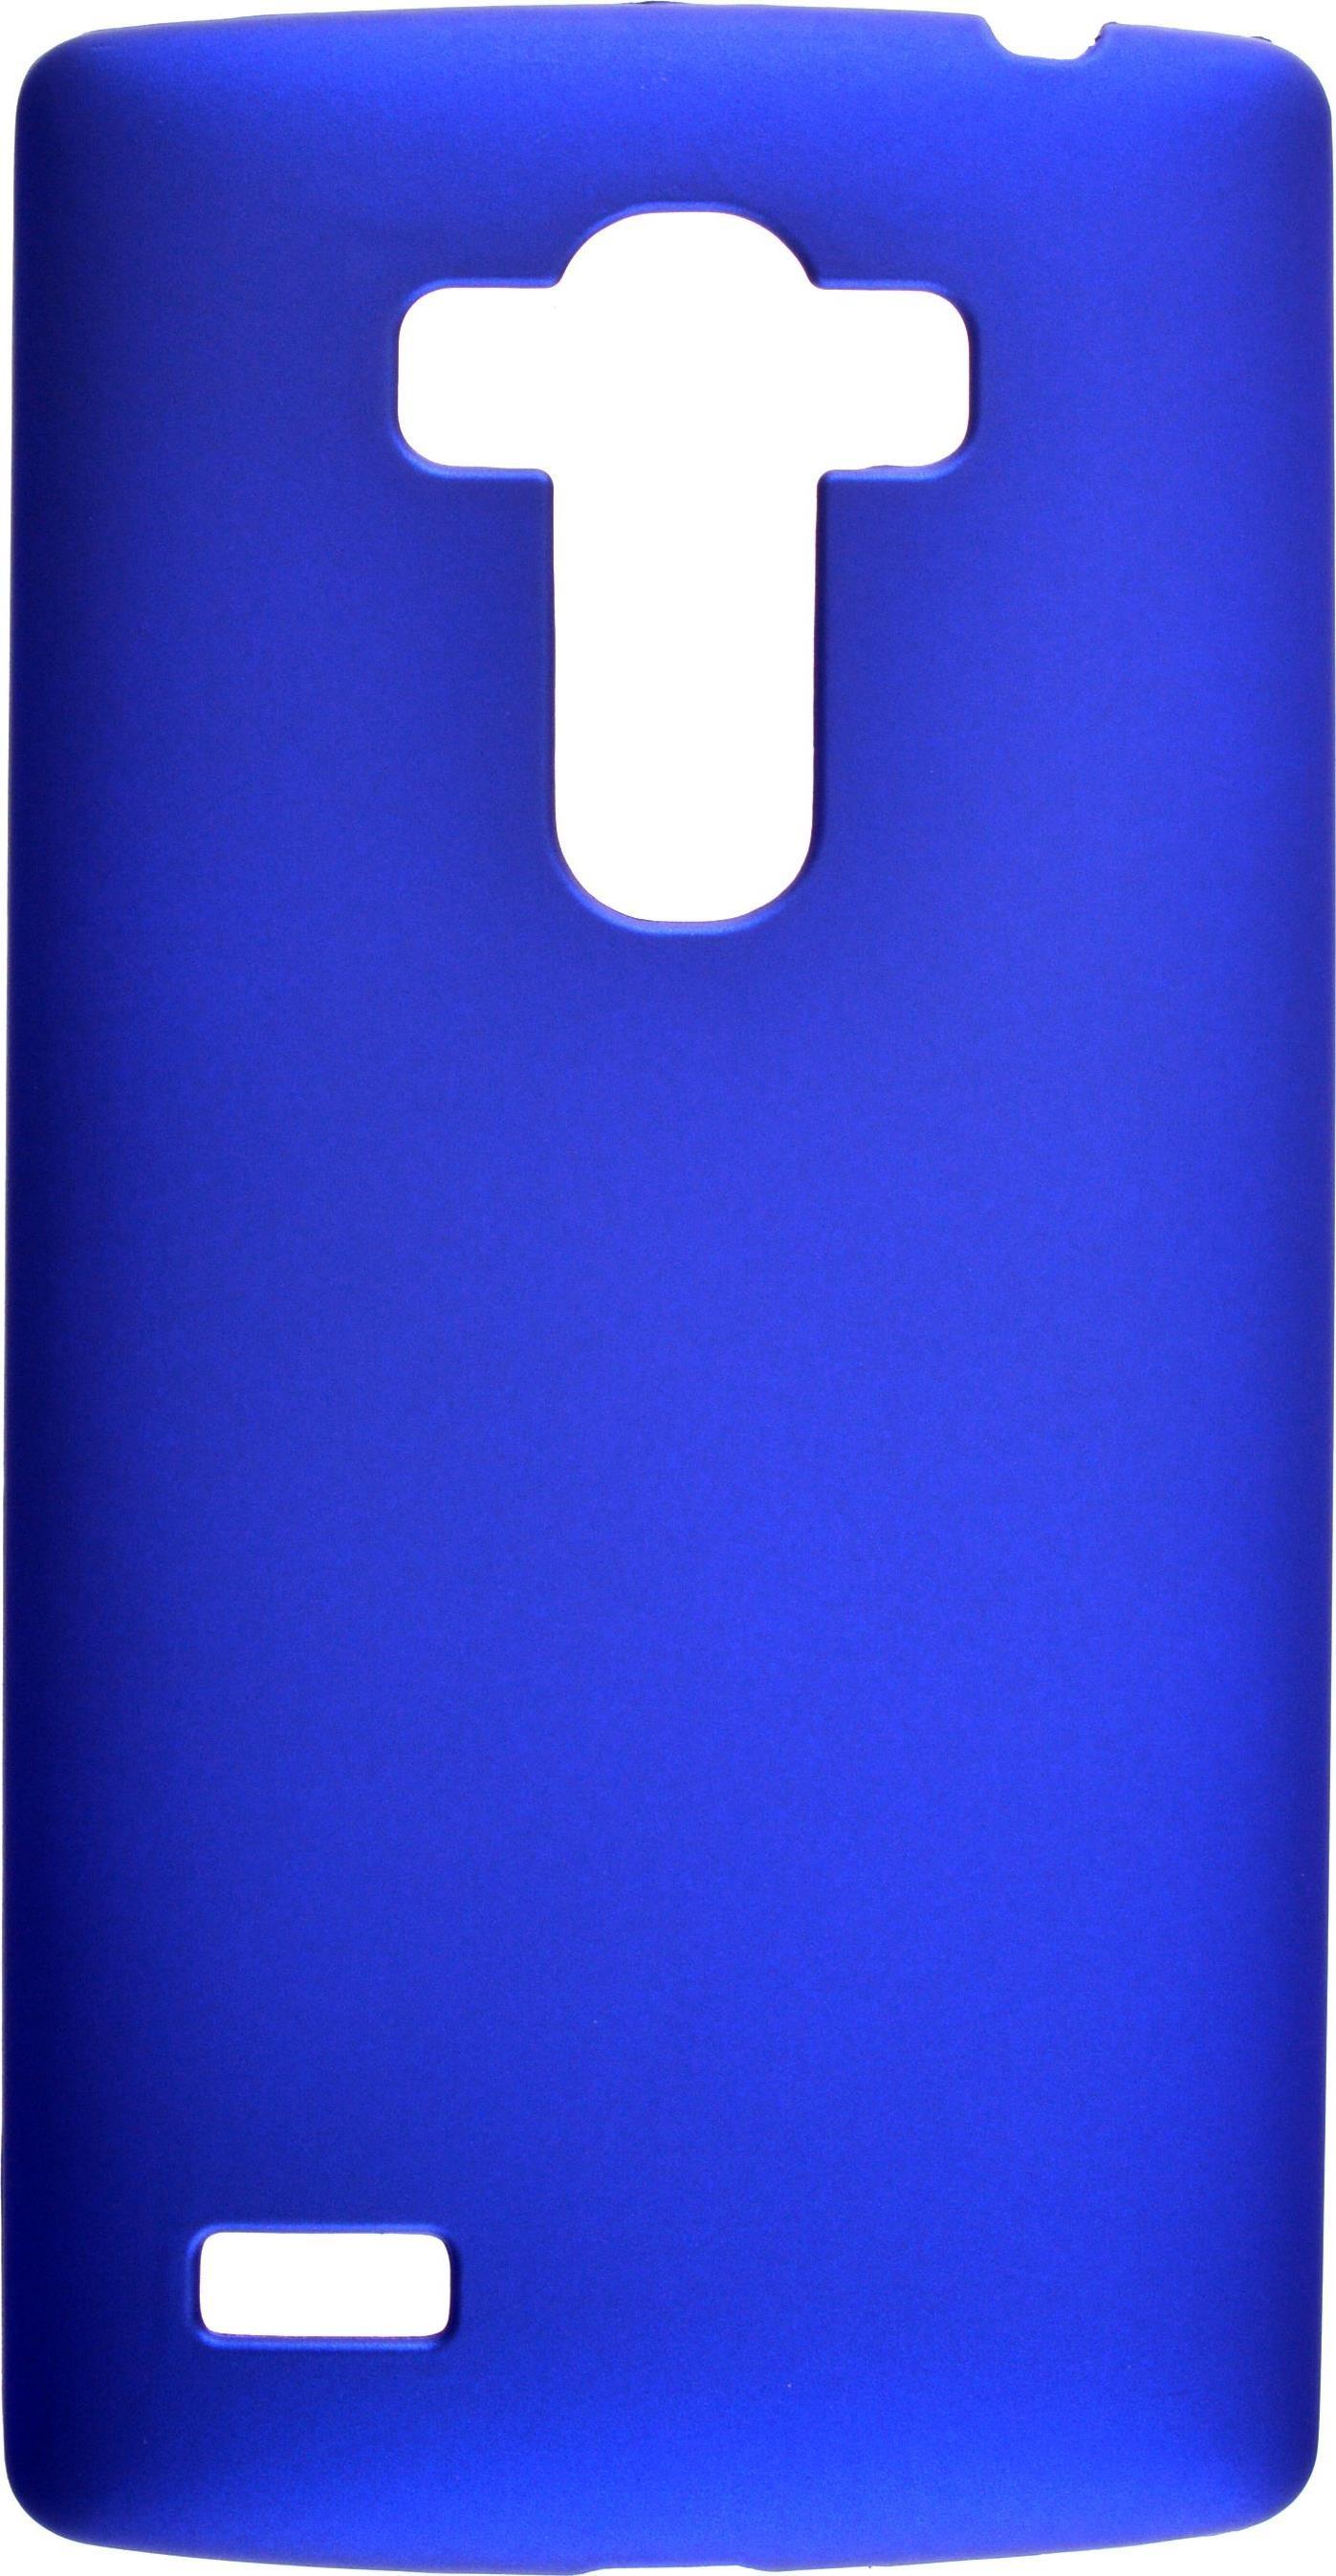 Чехол для сотового телефона skinBOX 4People, 4630042527218, синий все цены